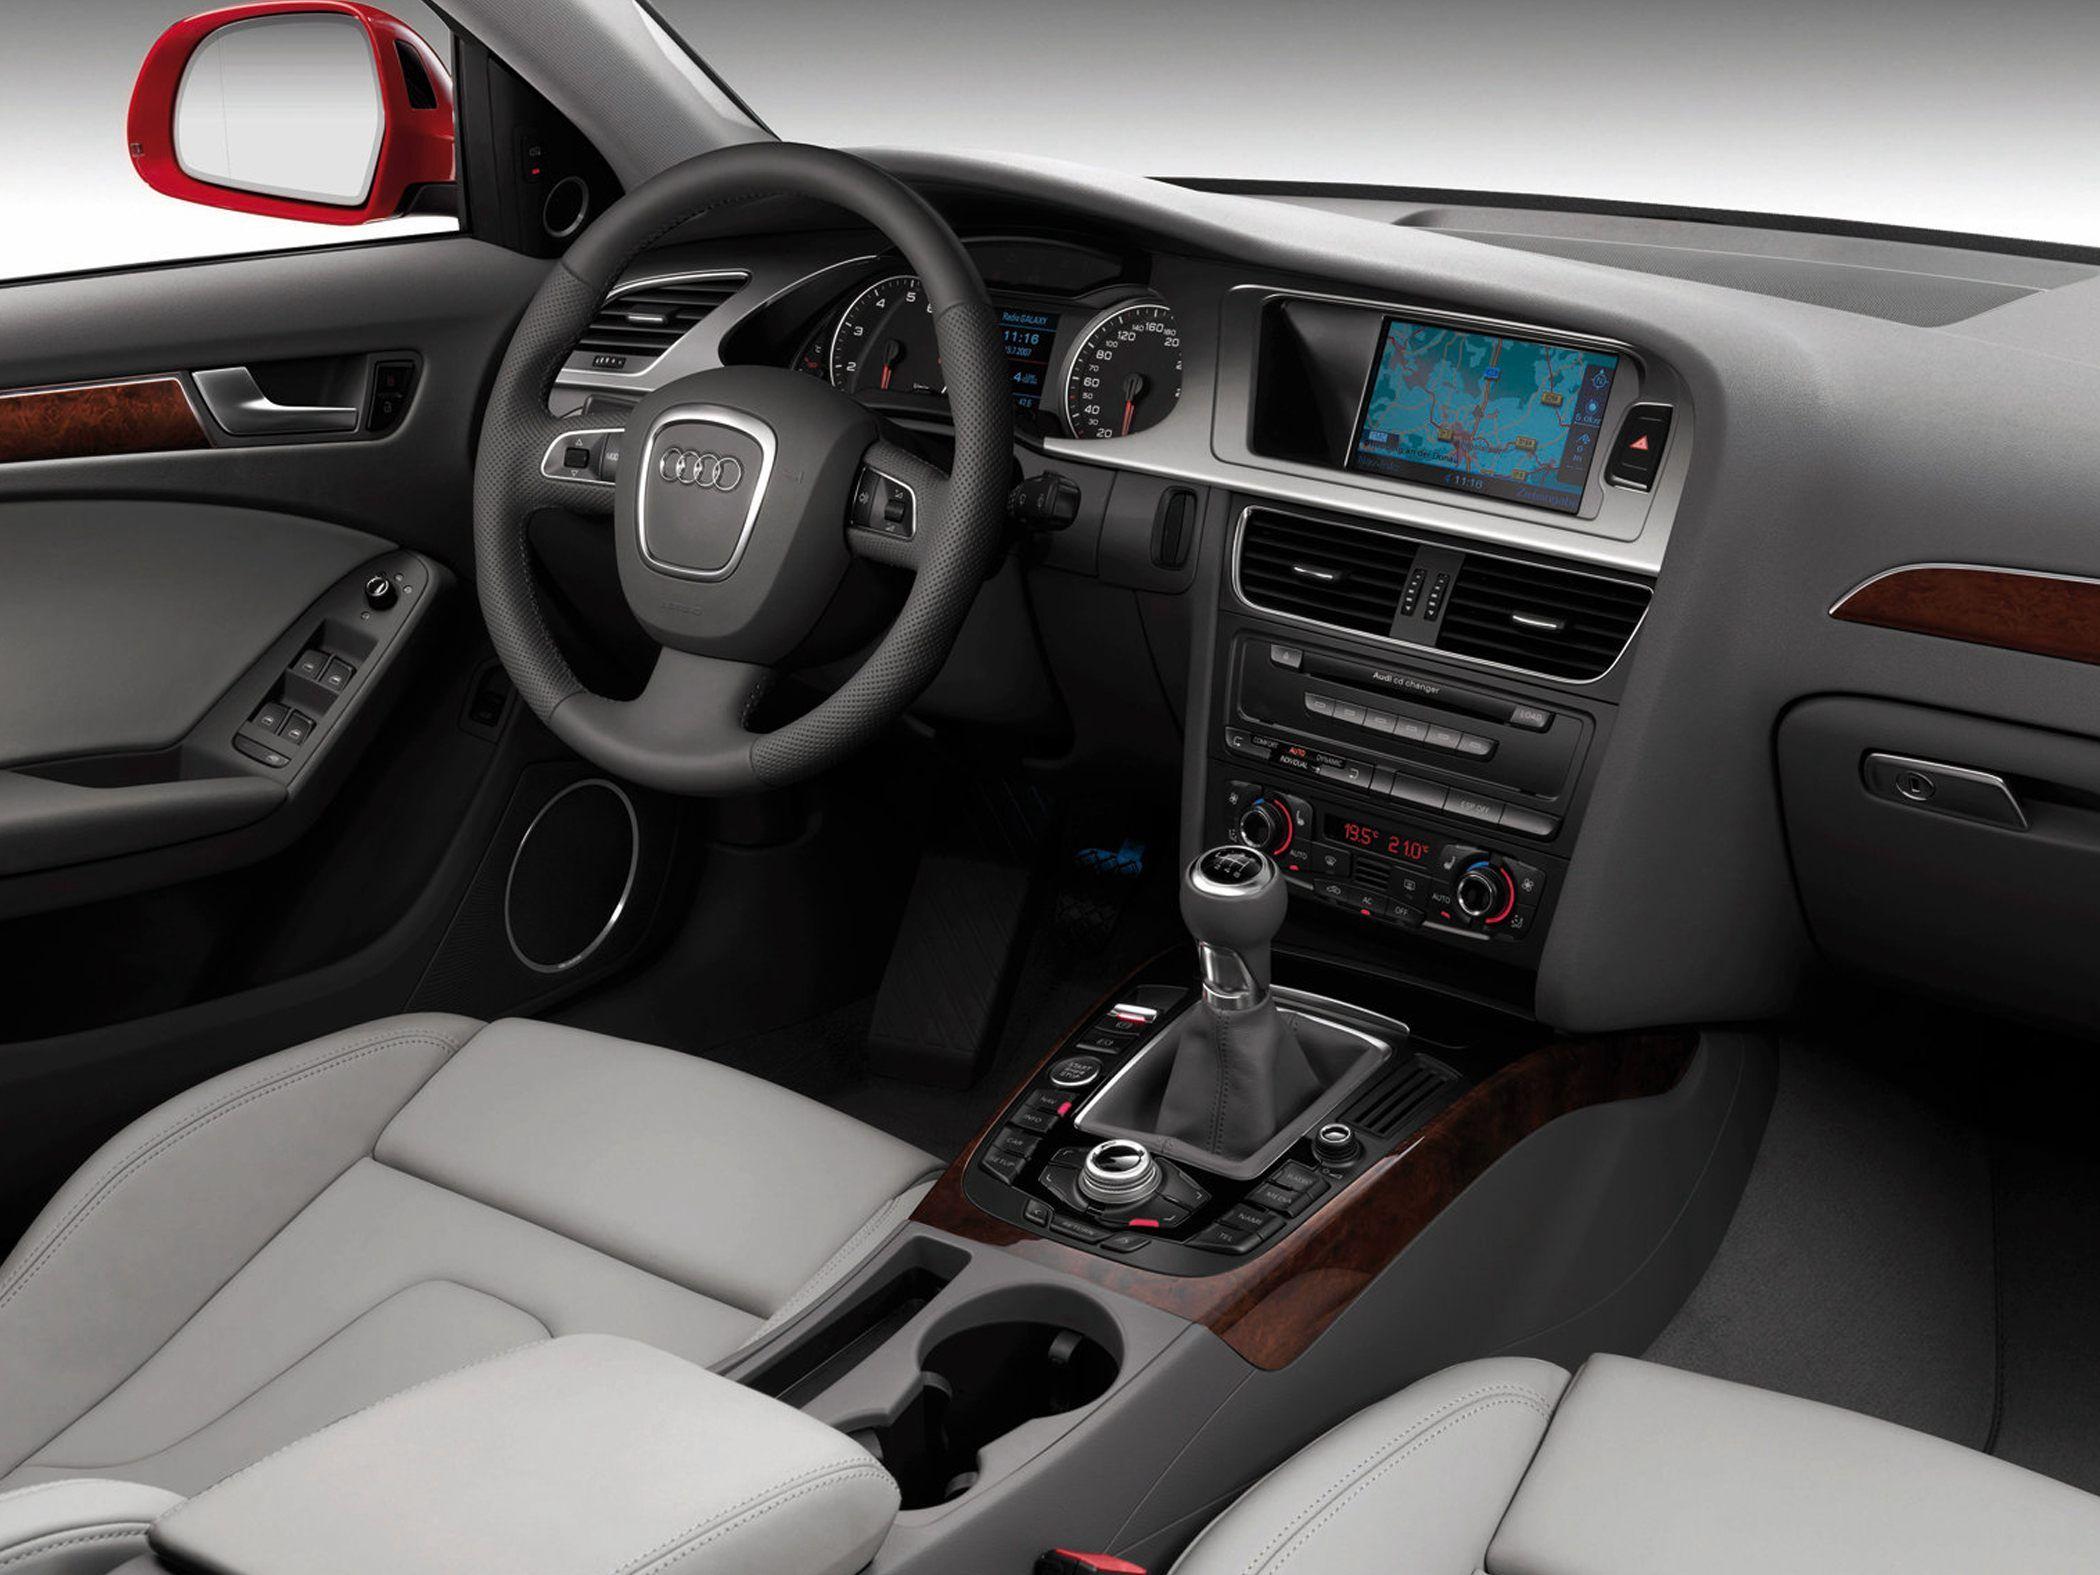 2011 audi a4 interior hd cars pinterest audi a4 audi and car magazine